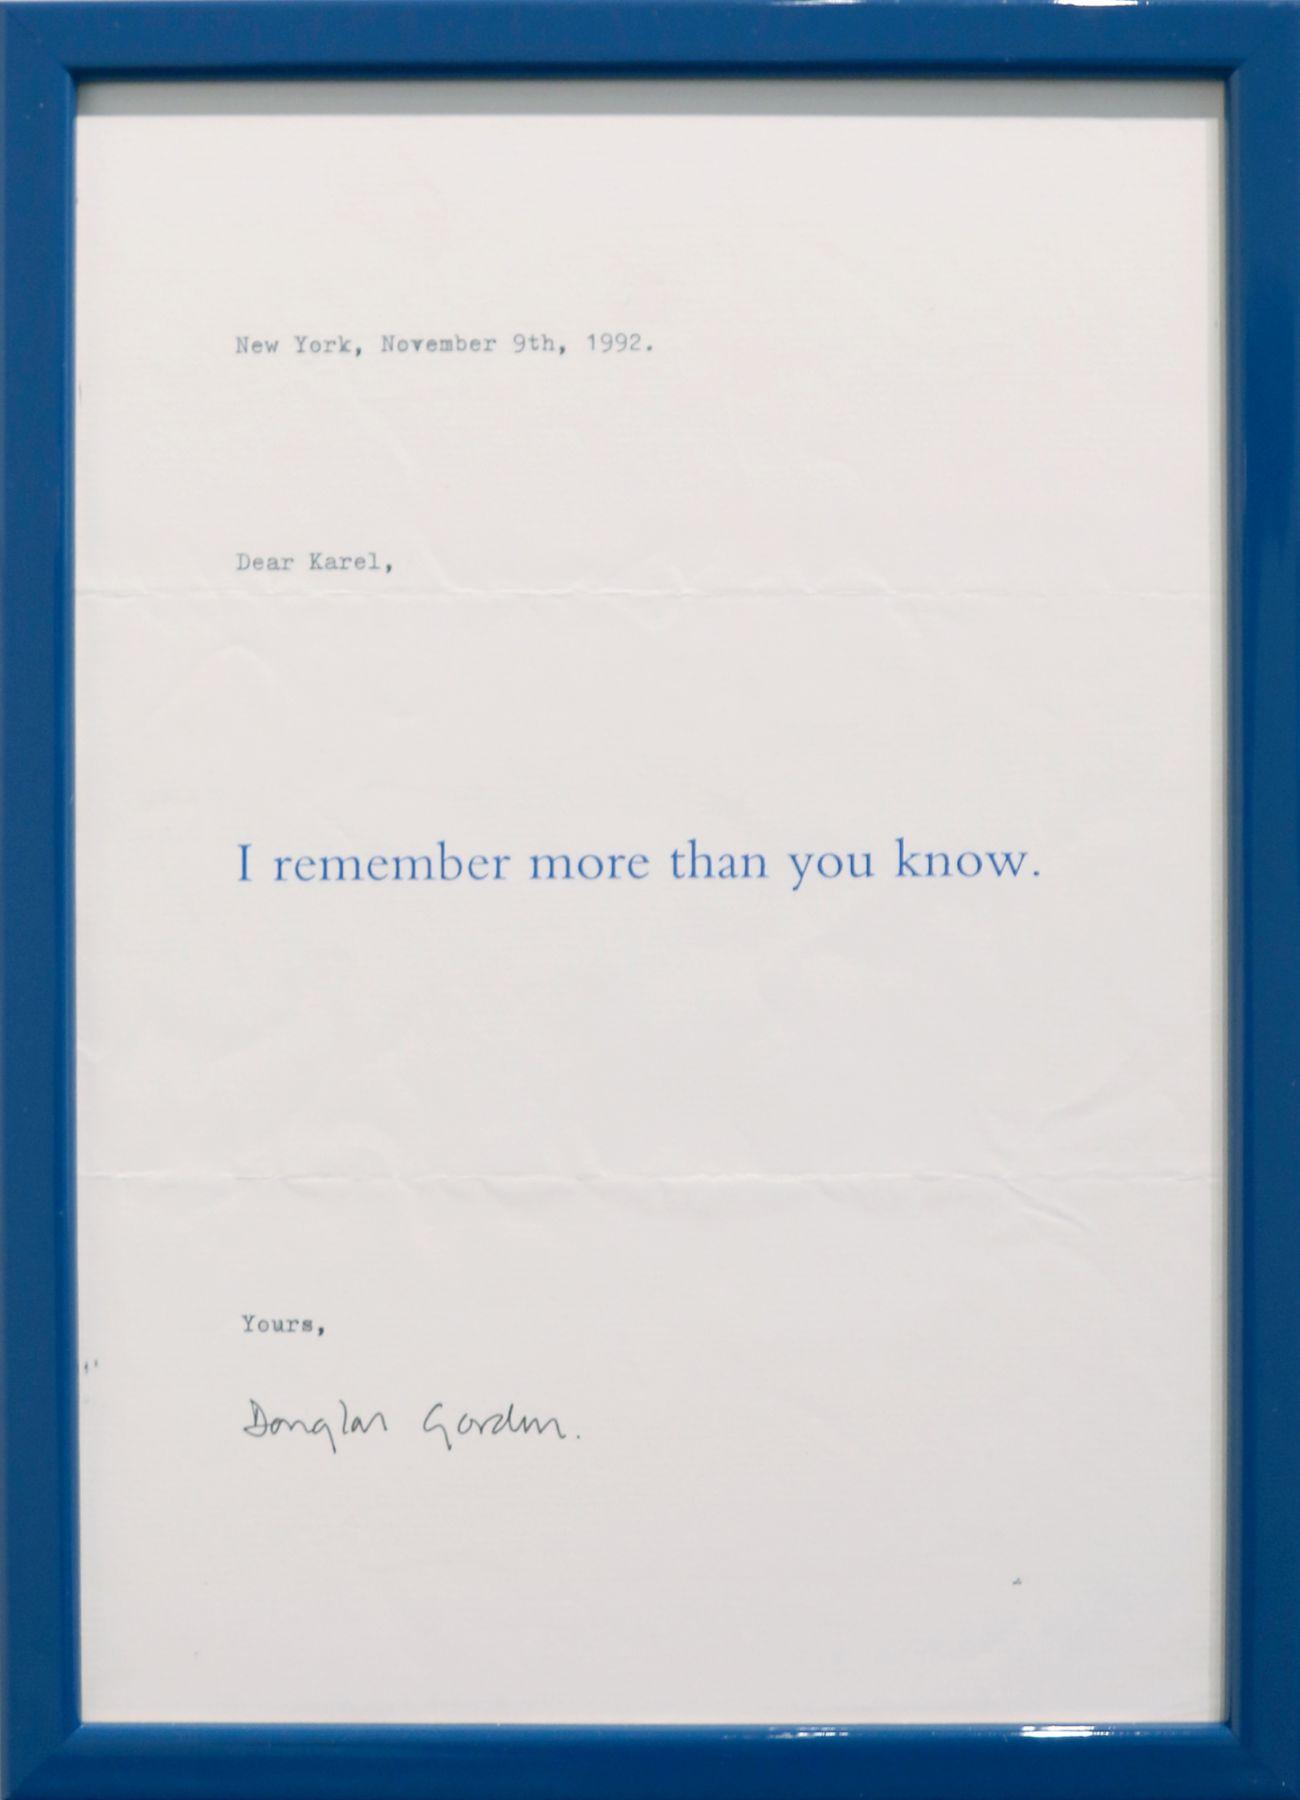 Douglas Gordon, I remember more than you know